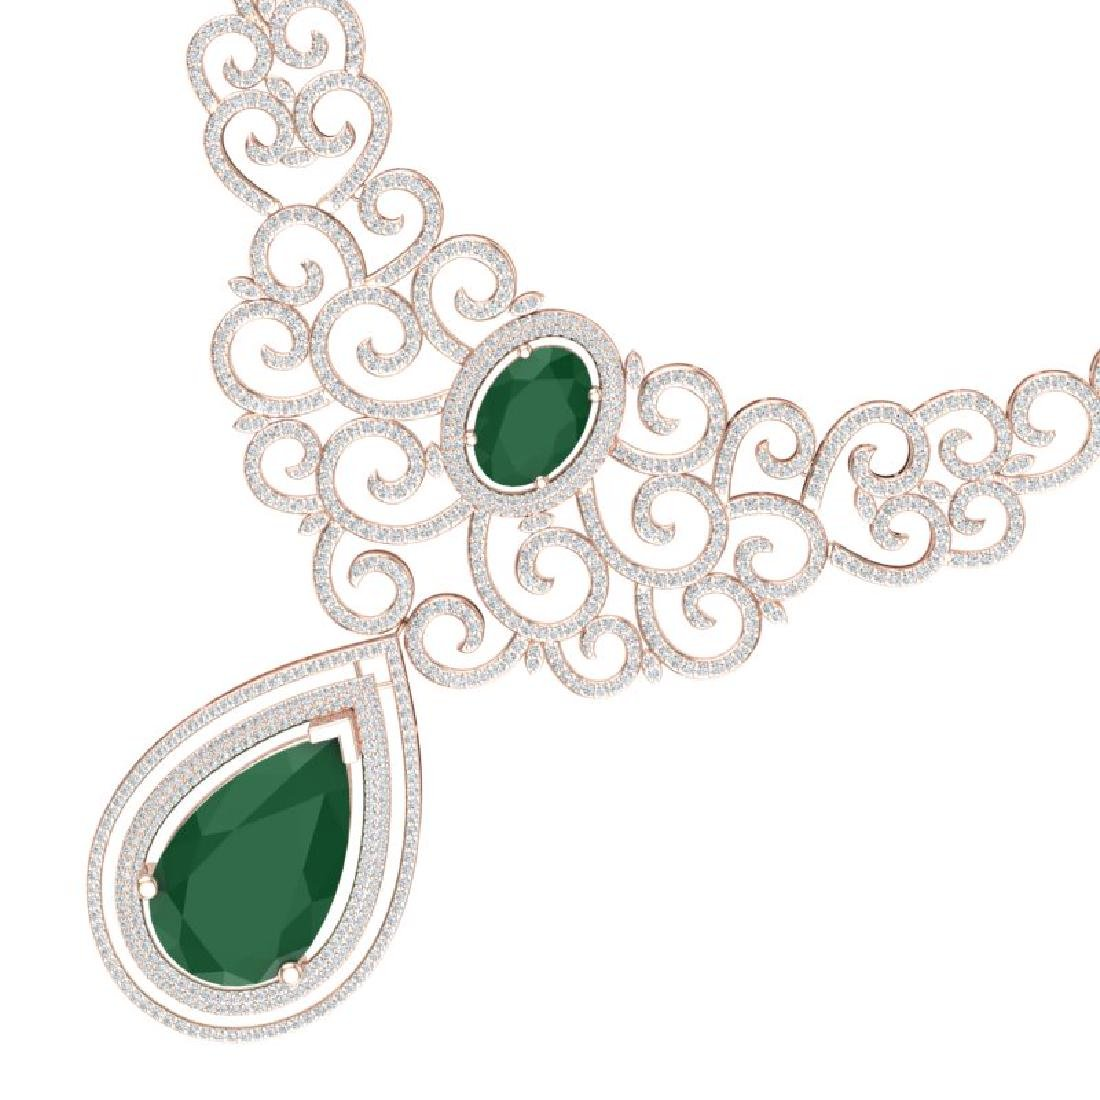 87.52 CTW Royalty Emerald & VS Diamond Necklace 18K